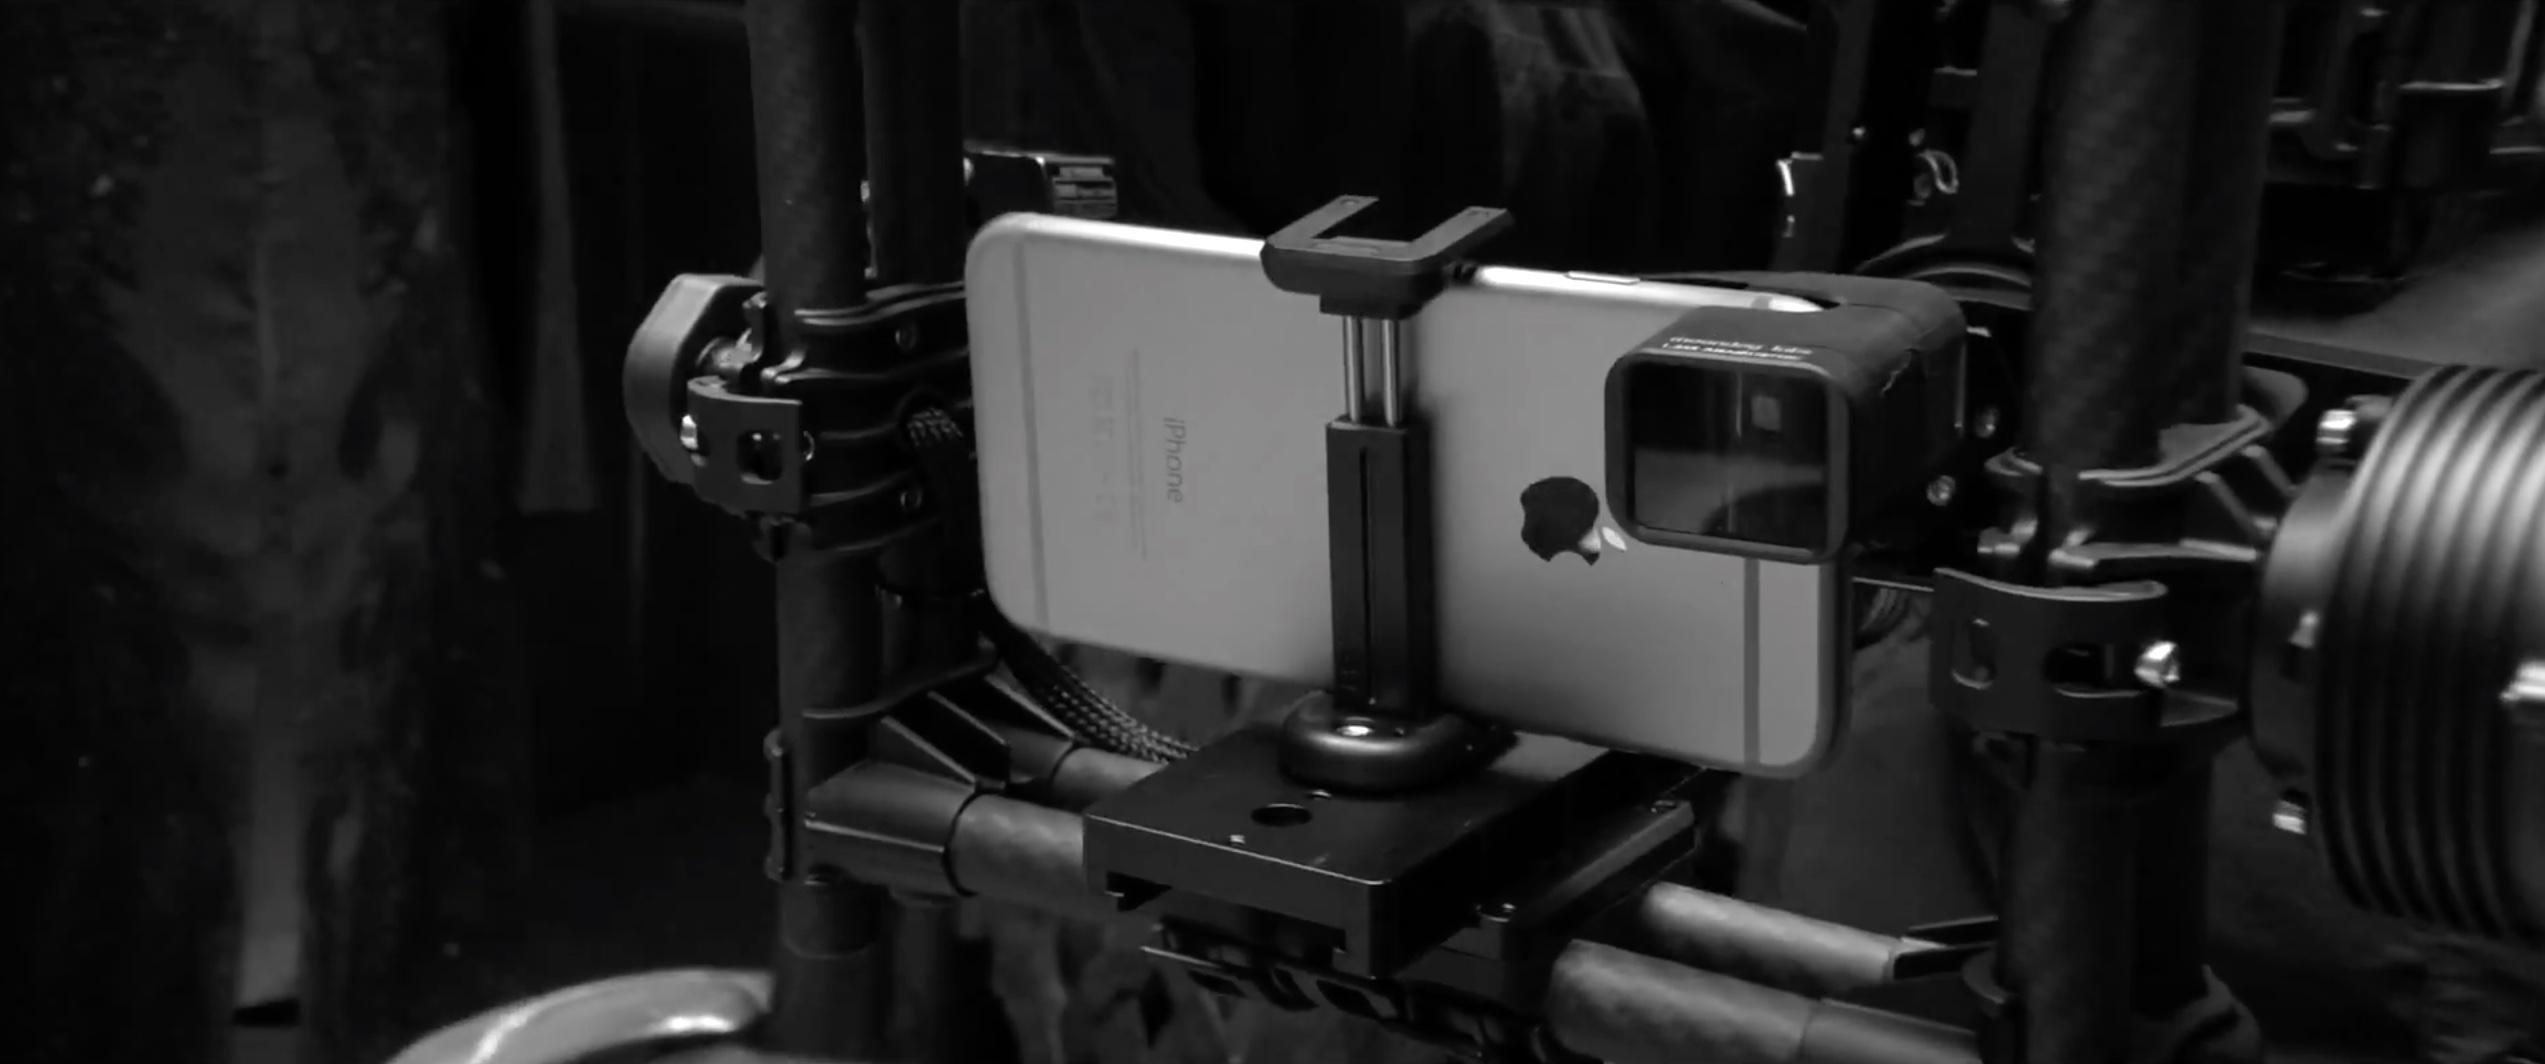 Comercial da Bentley filmado com iPhones